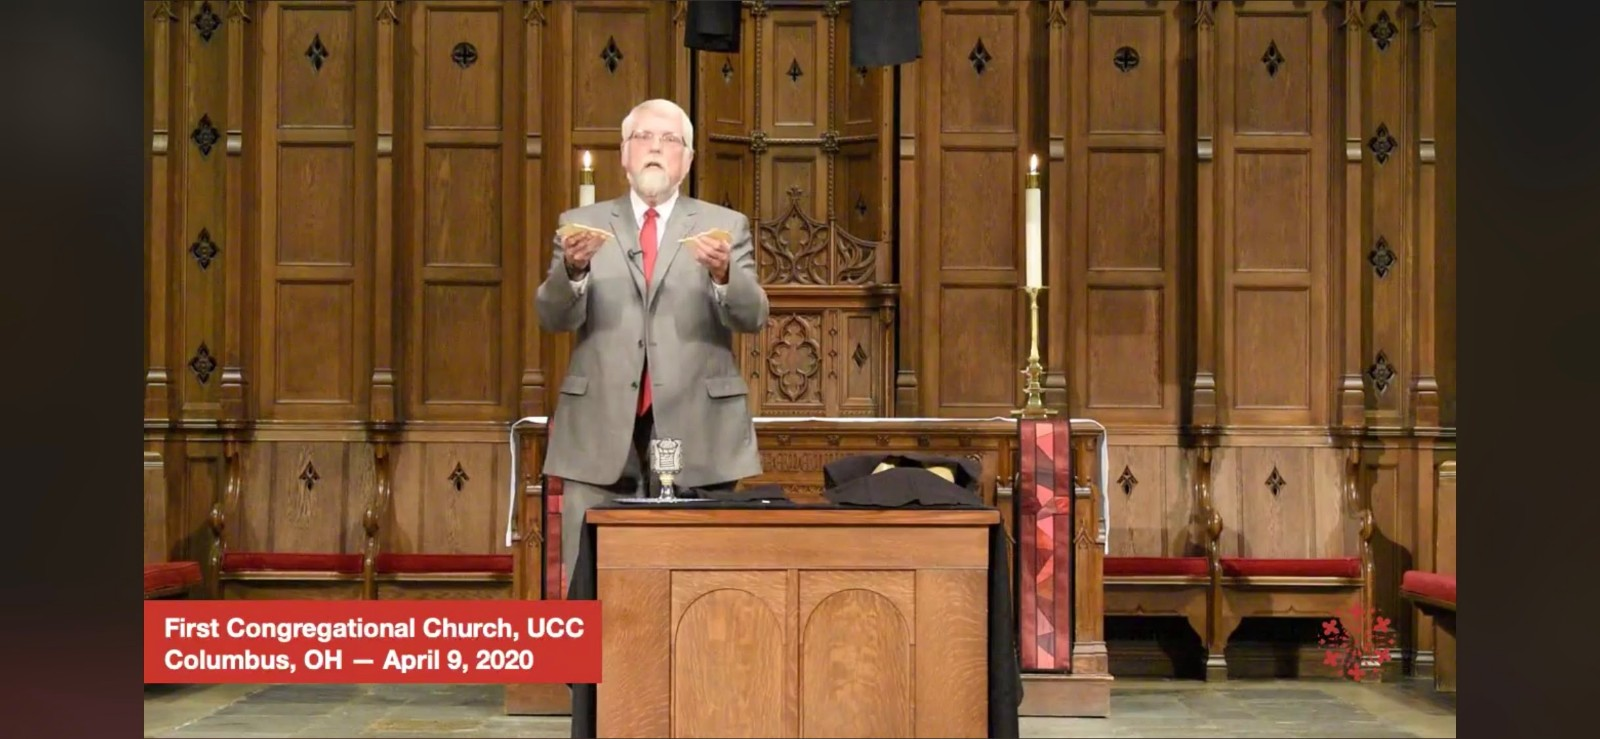 Abolitionist Communion table, 1st Congregational UCC, Columbus, 4/9/20